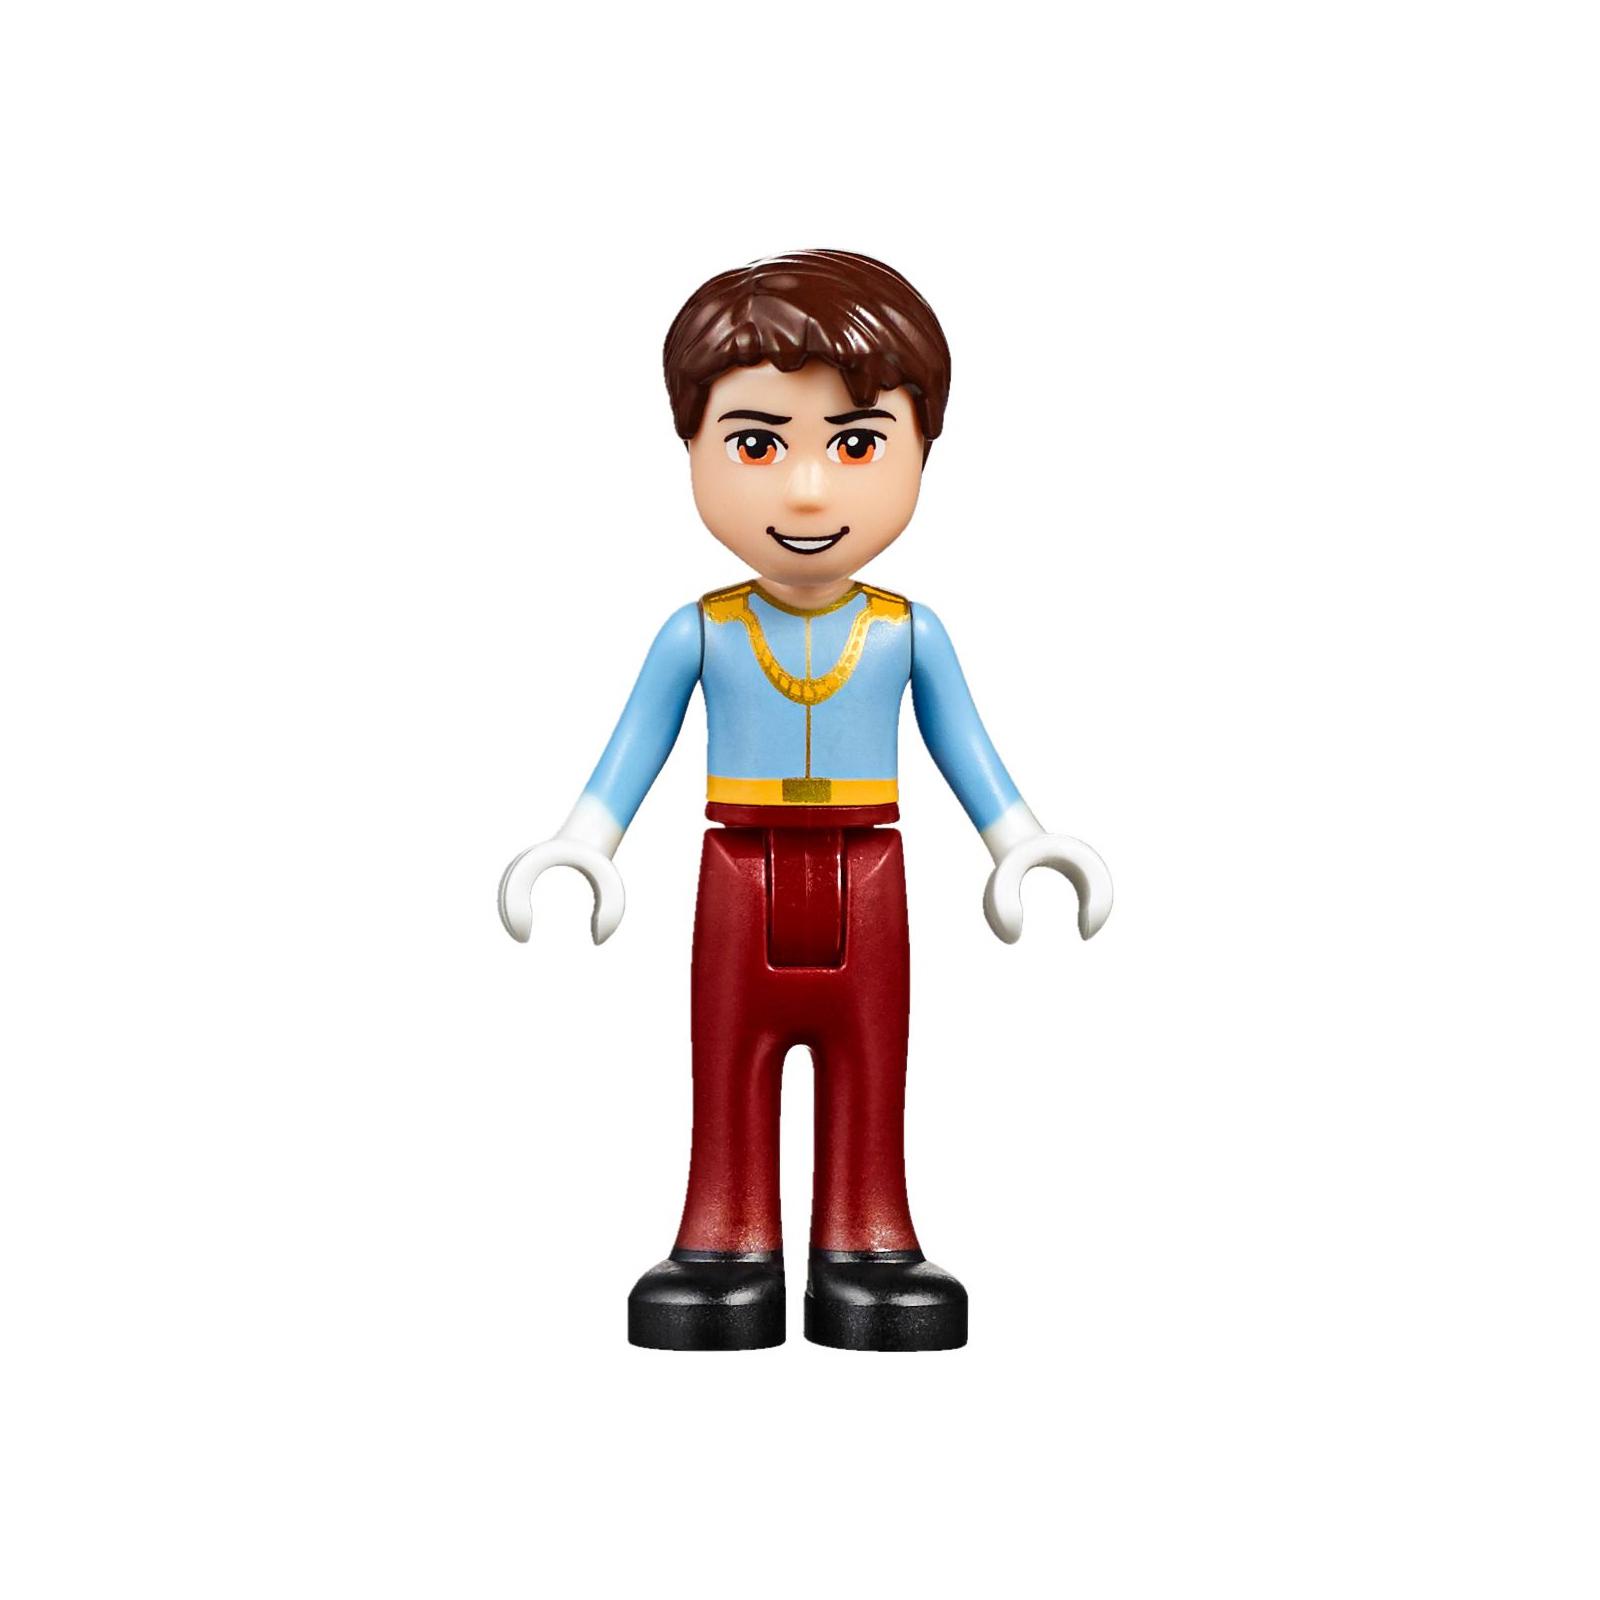 Конструктор LEGO Juniors Карета Золушки (10729) изображение 10